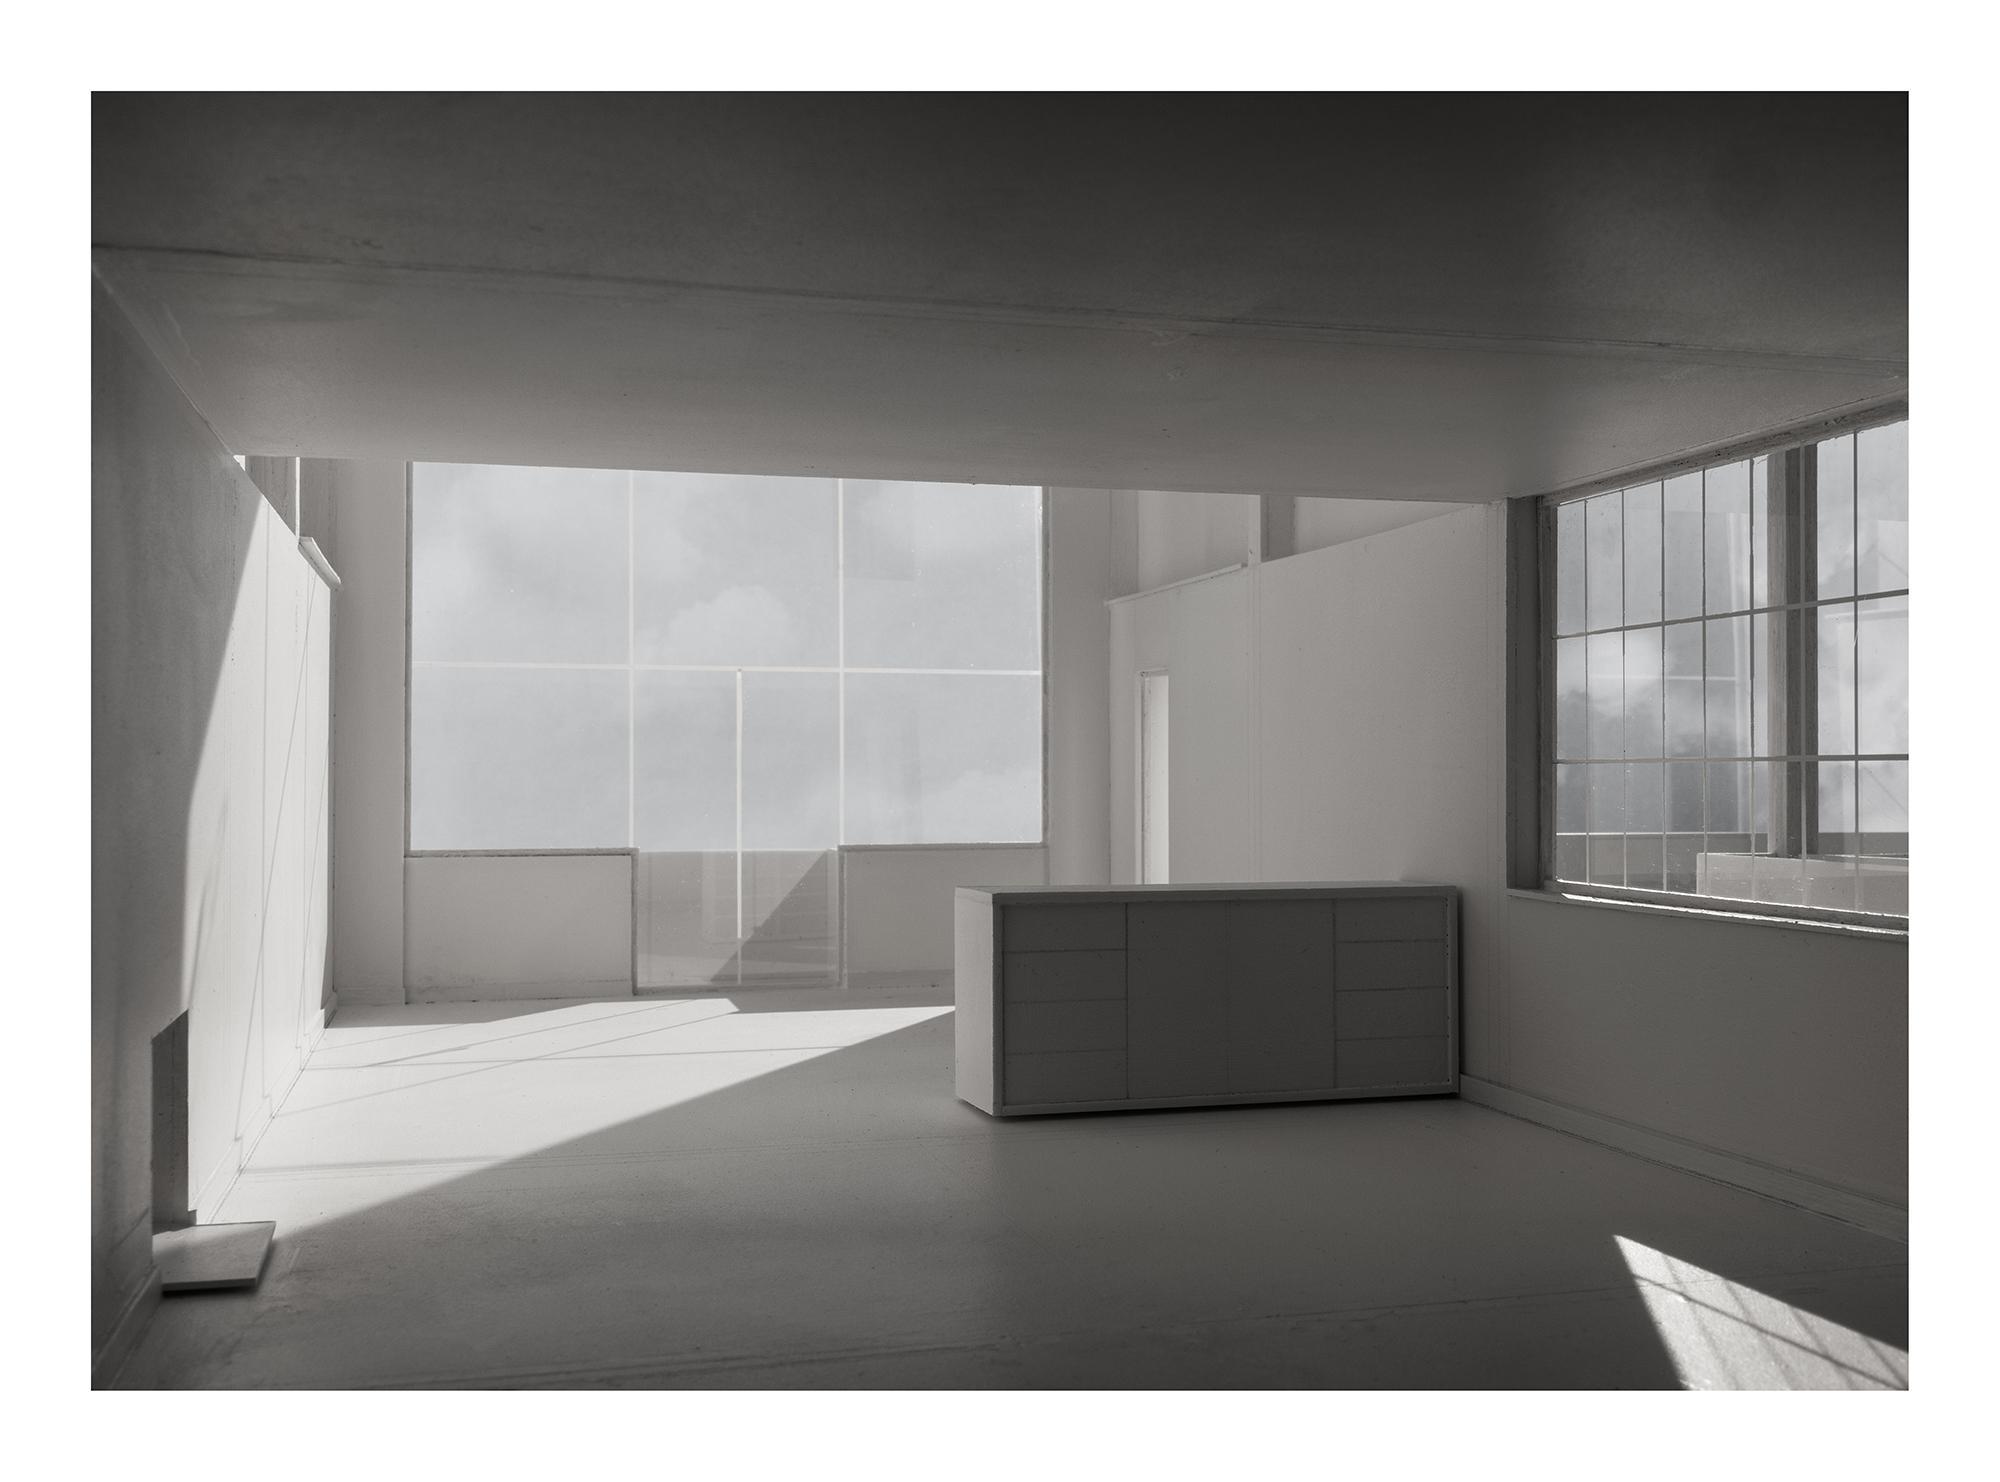 L.h.dc-5 Immeuble-Villas. 1922. Le Corbusier. Impresión digital, papel algodón Hahnemühle. 120X167cm. Edición 5+2 P.A.